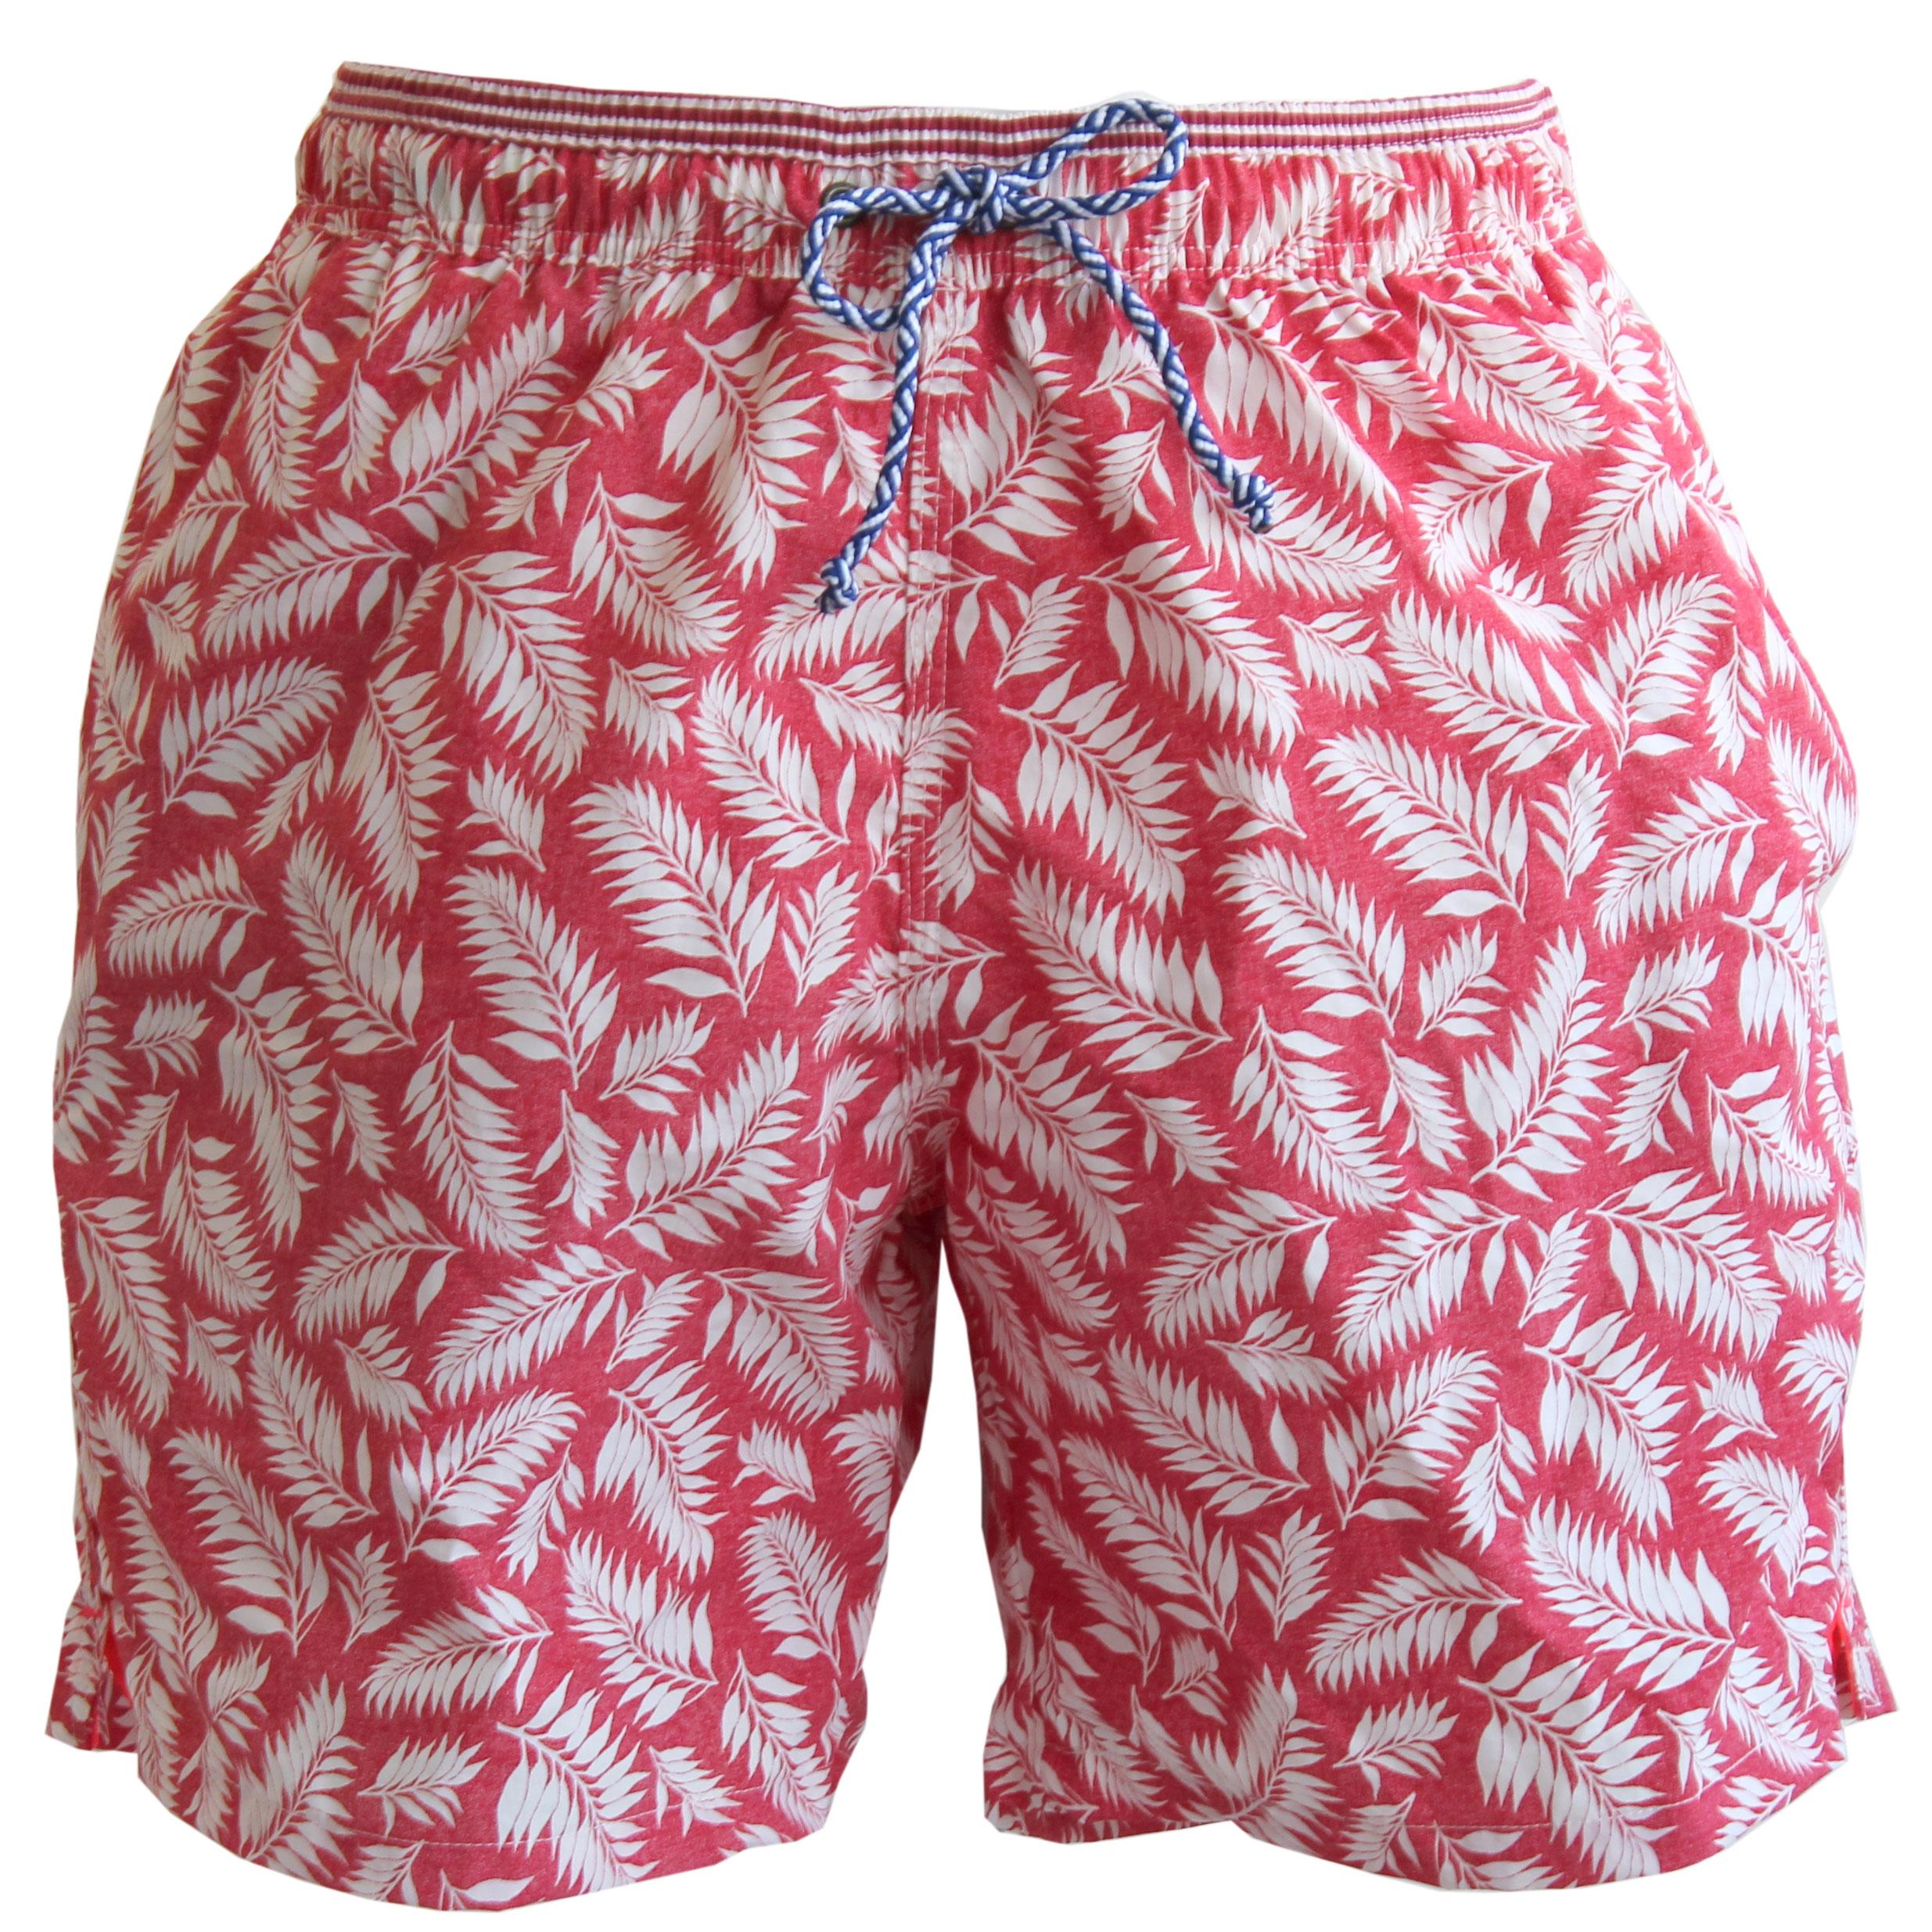 1f941de81ed9d red leaf print swim trunks